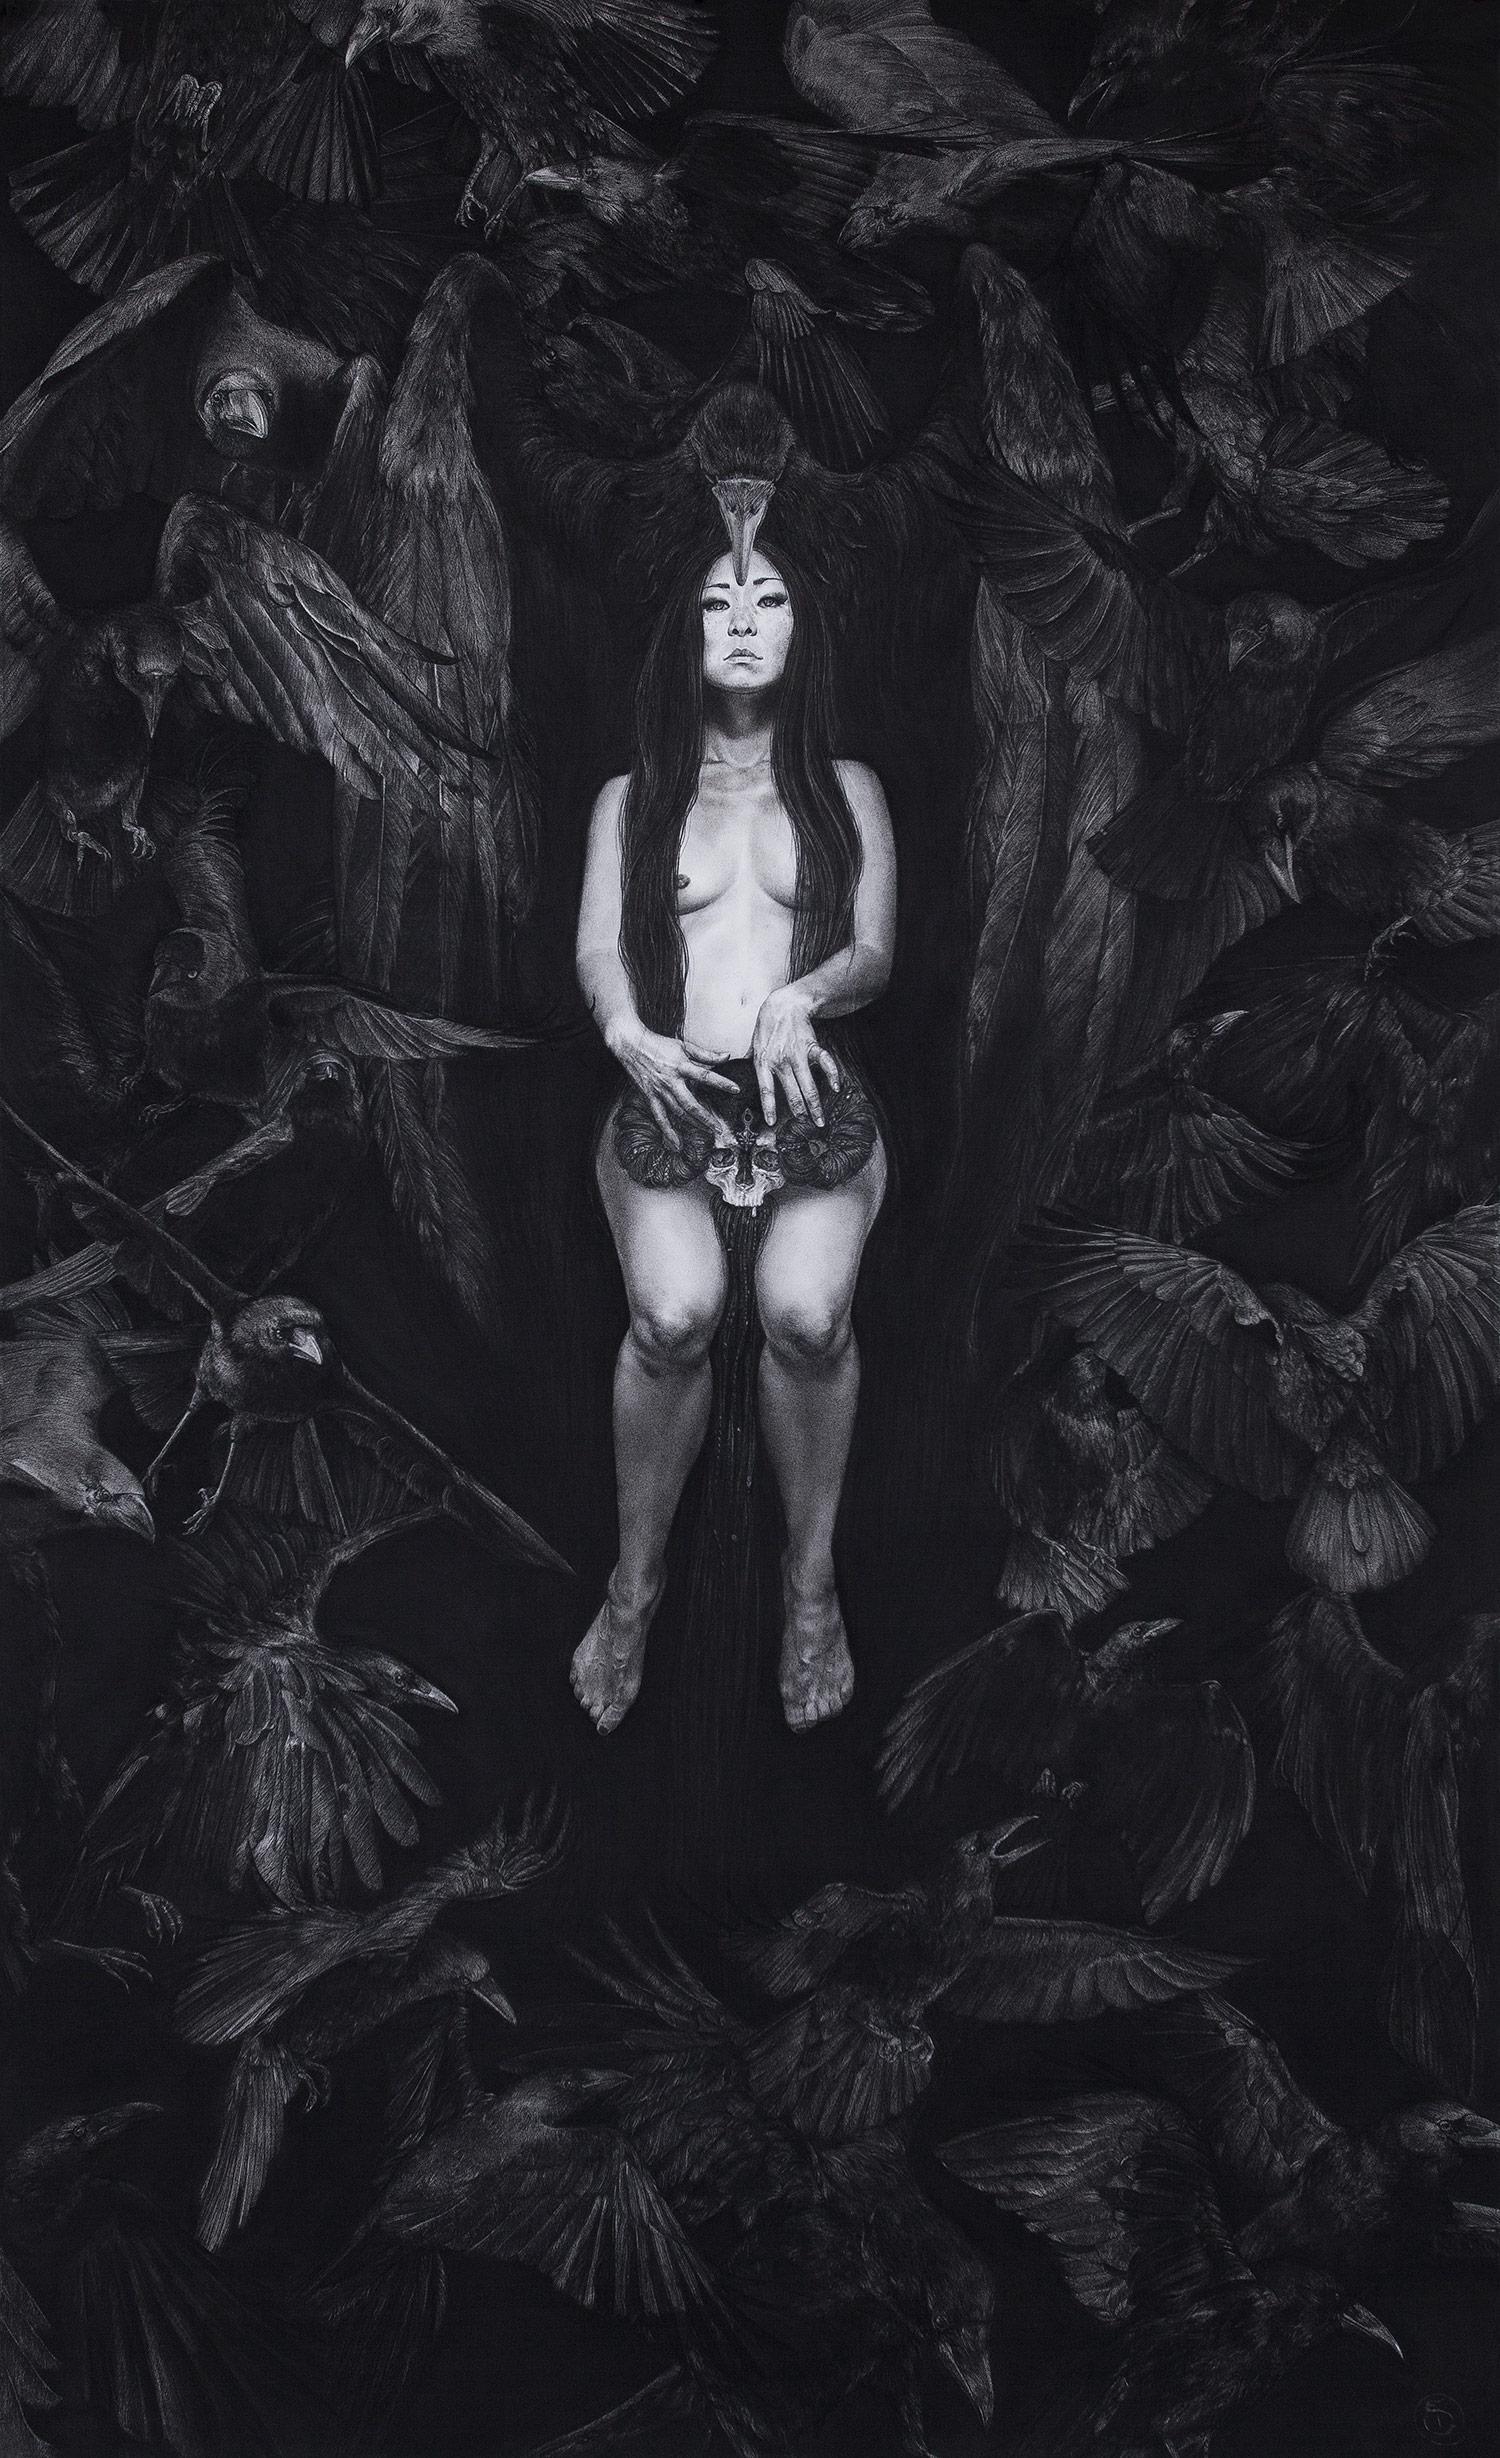 Stephanie Inagaki - Tempest